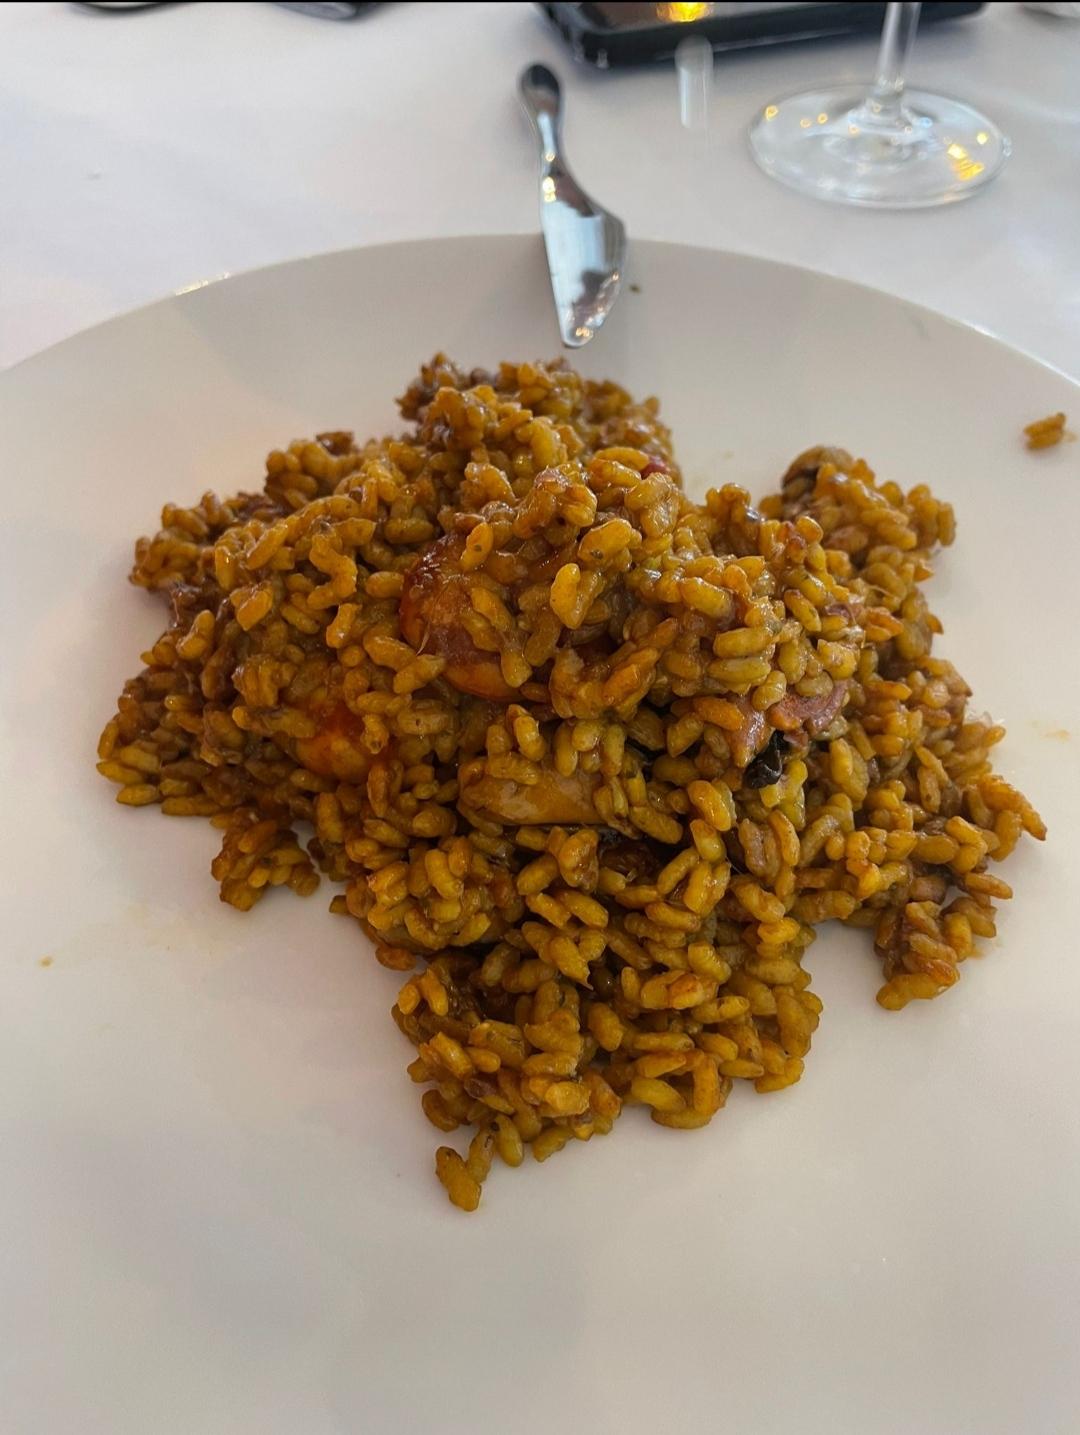 Reseñas gastronómicas: Restaurante Bon Vent 5